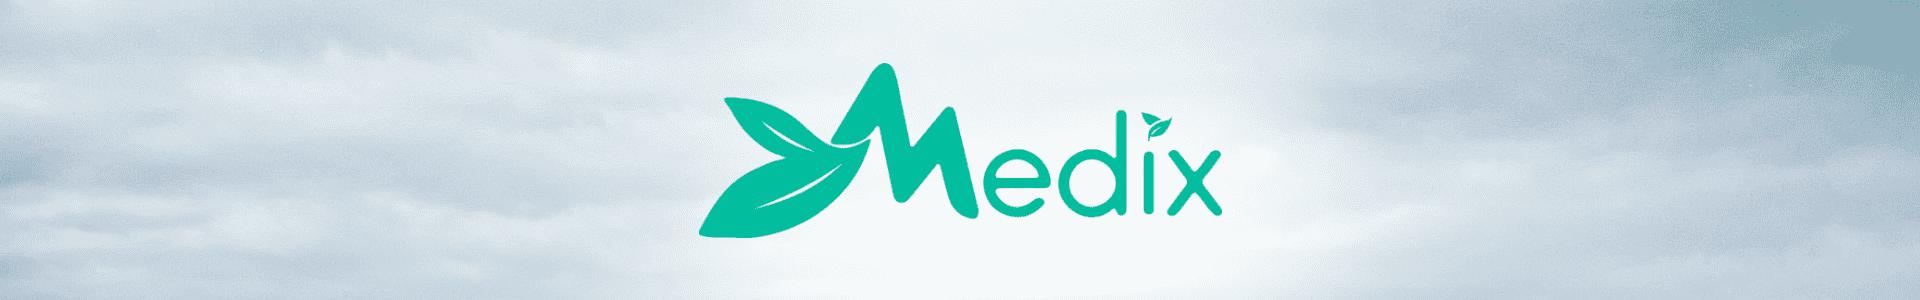 Buy Medix CBD Online